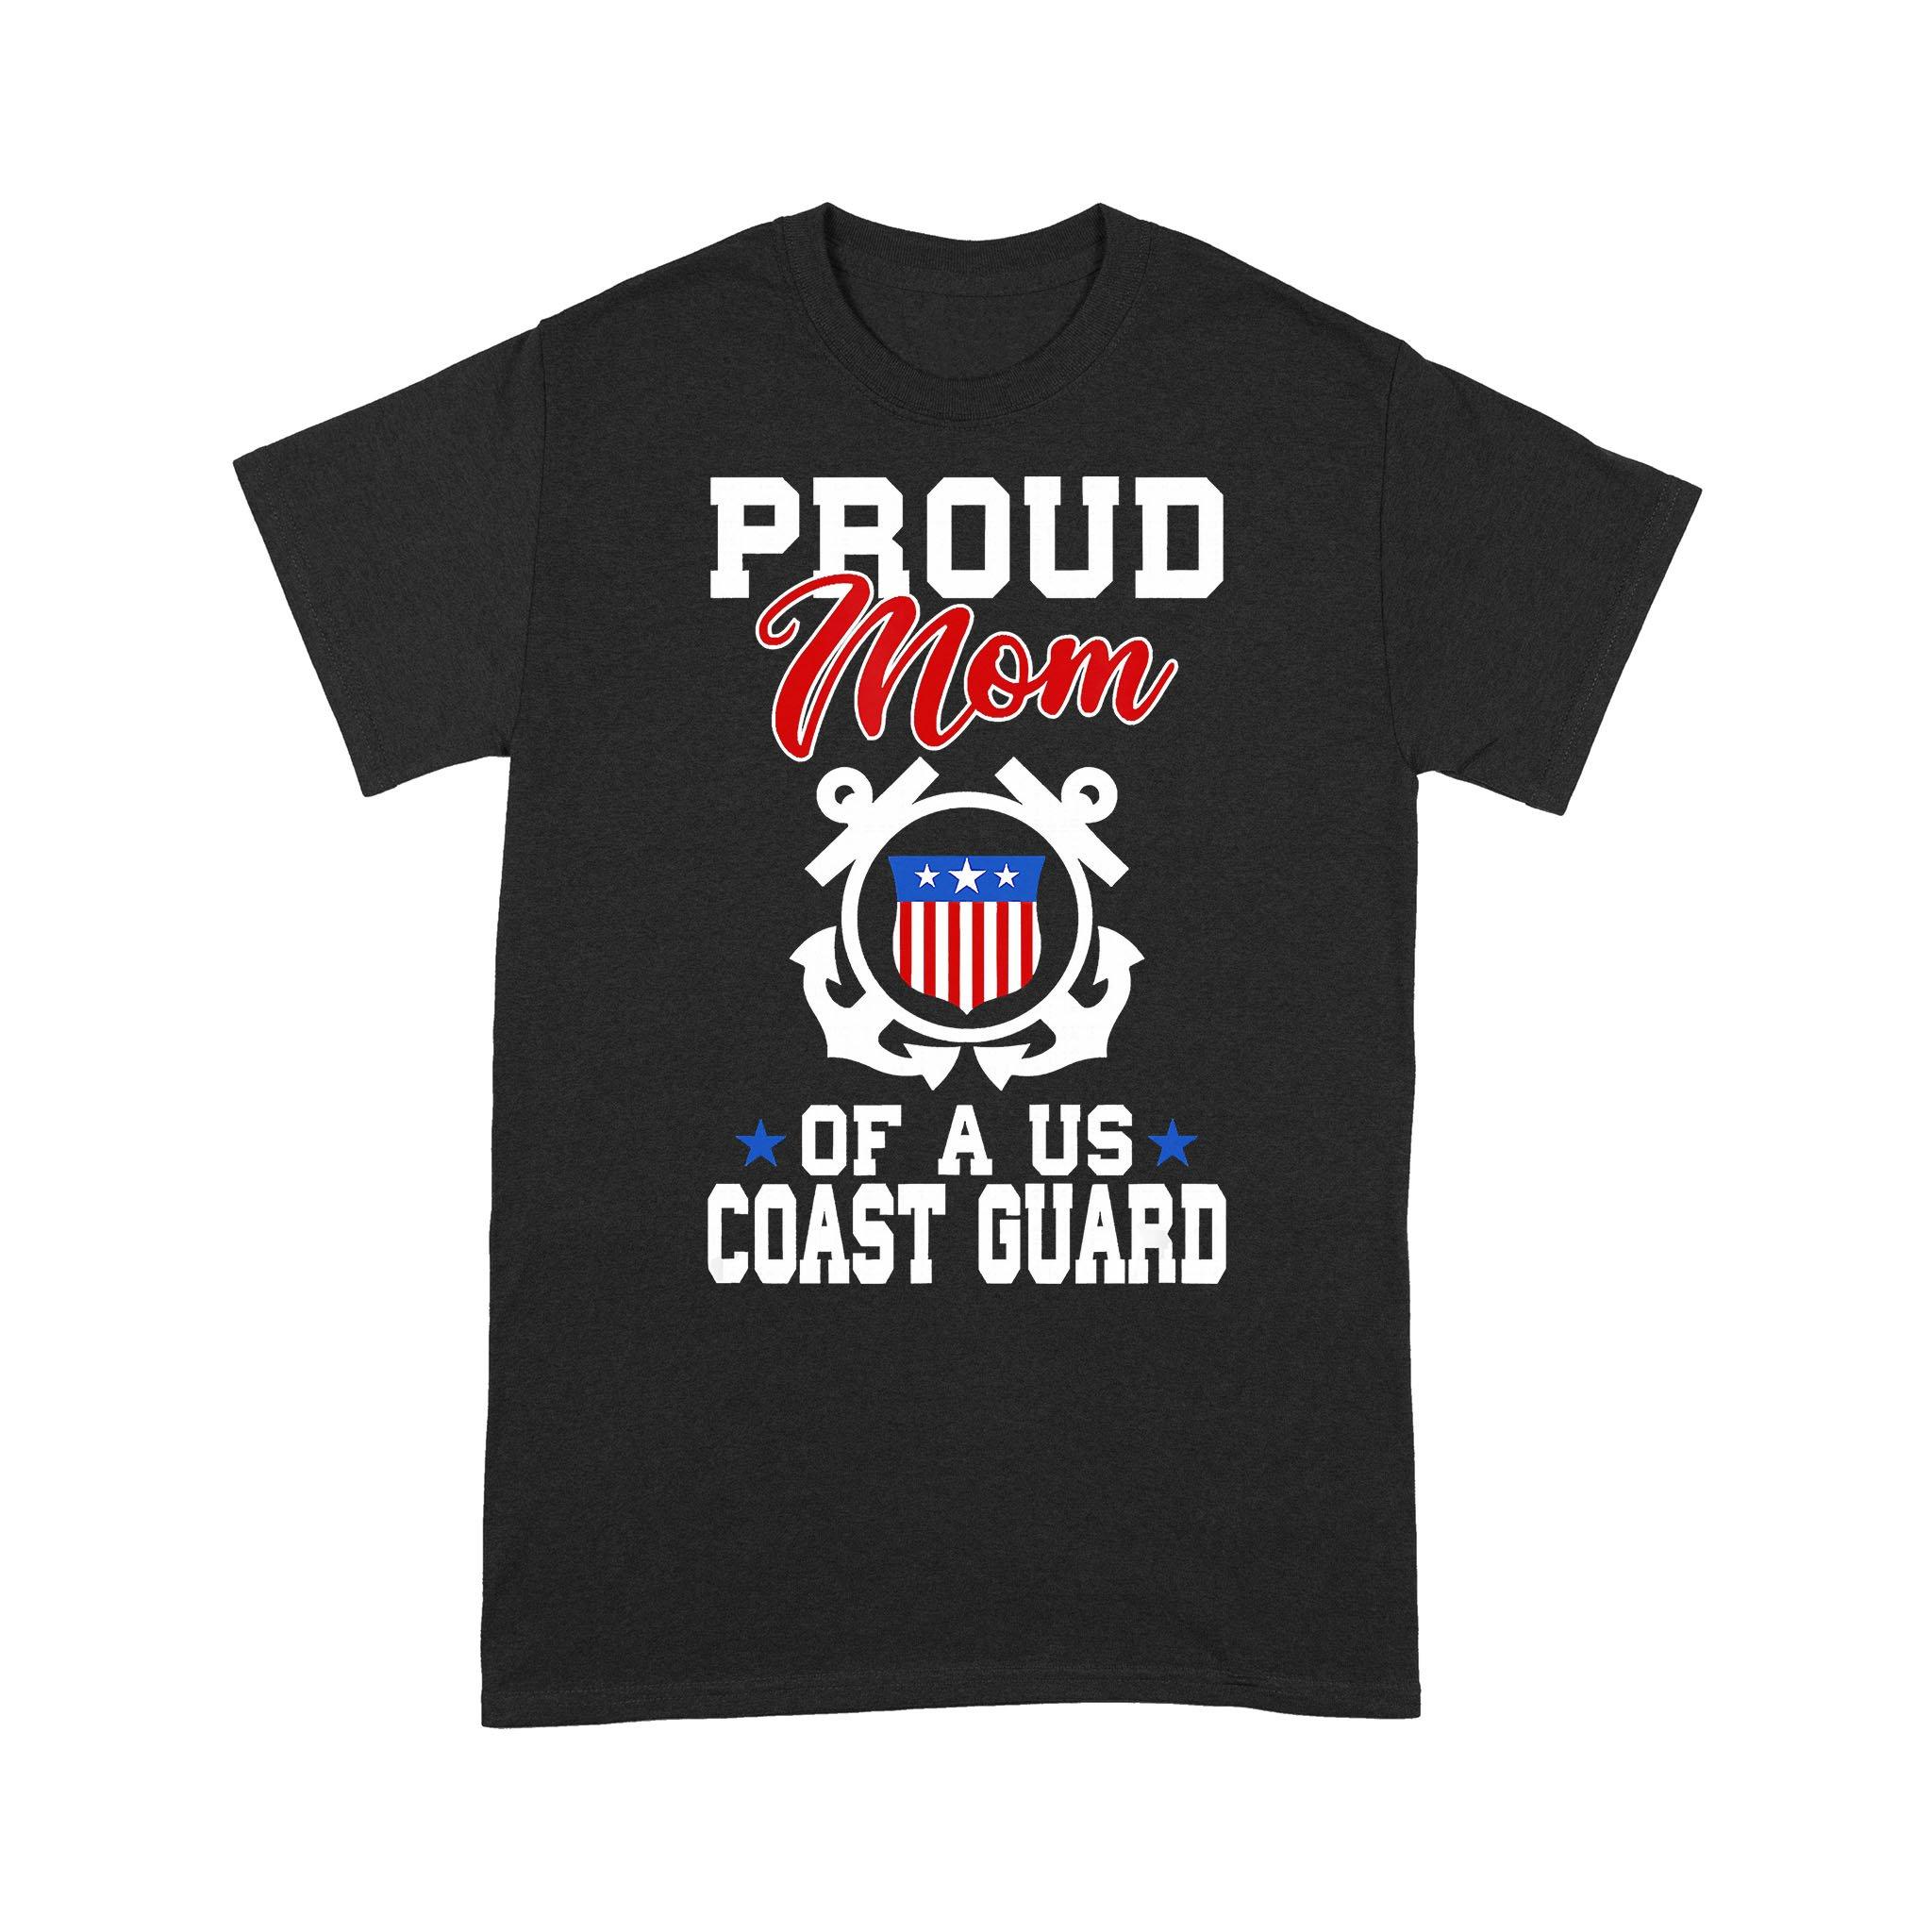 Proud Mom Of A Us Coast Guard American Flag T-shirt